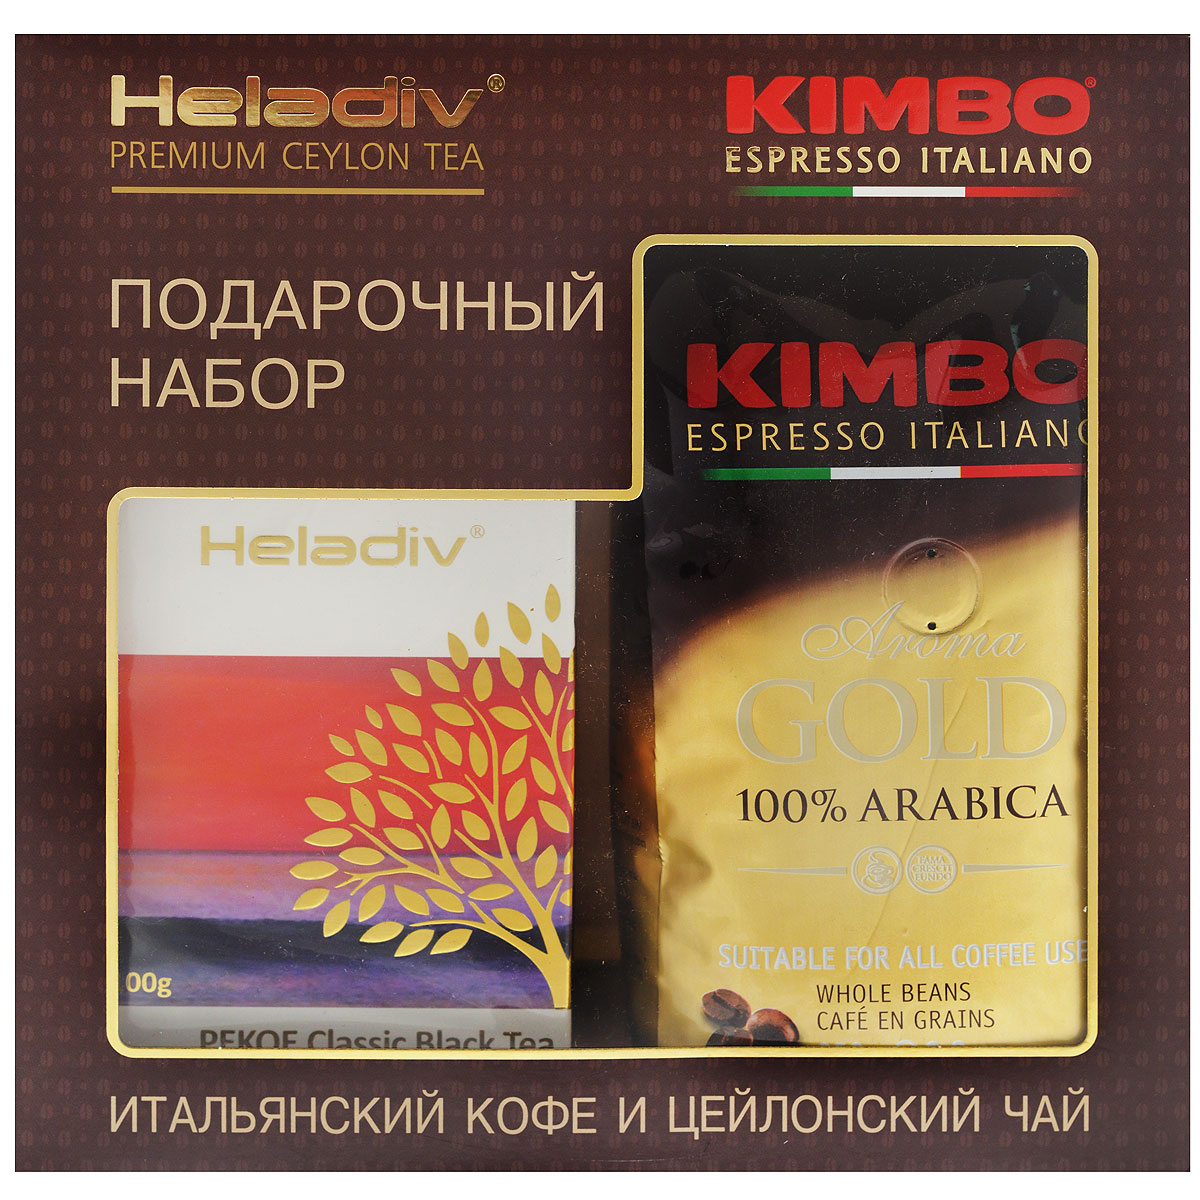 Heladiv Pekoe черный чай 100 г + Kimbo Aroma Gold 250 г кофе в зернах (подарочный набор) набор kimbo подарочный набор кофе kimbo и чай heladiv